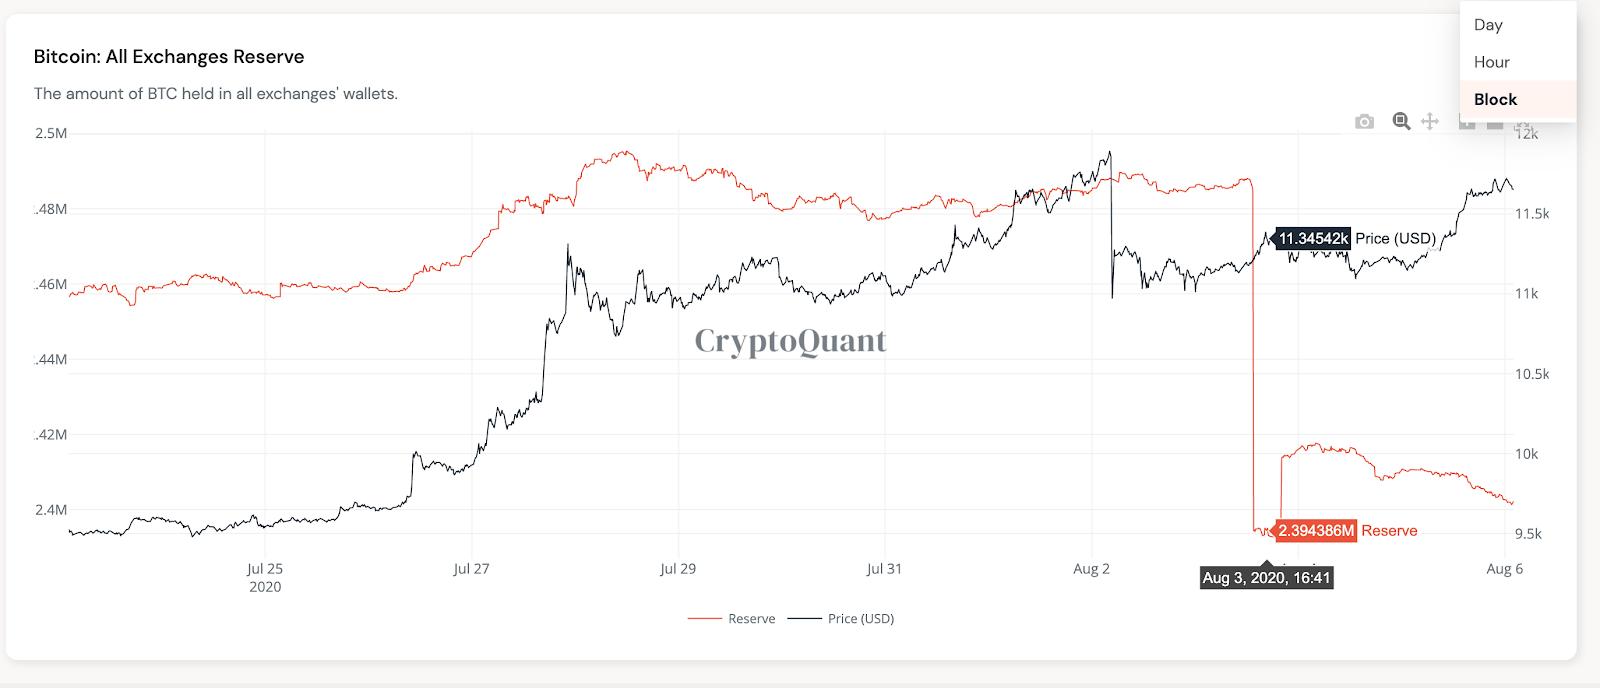 Bitcoin exchange reserves 2-week chart